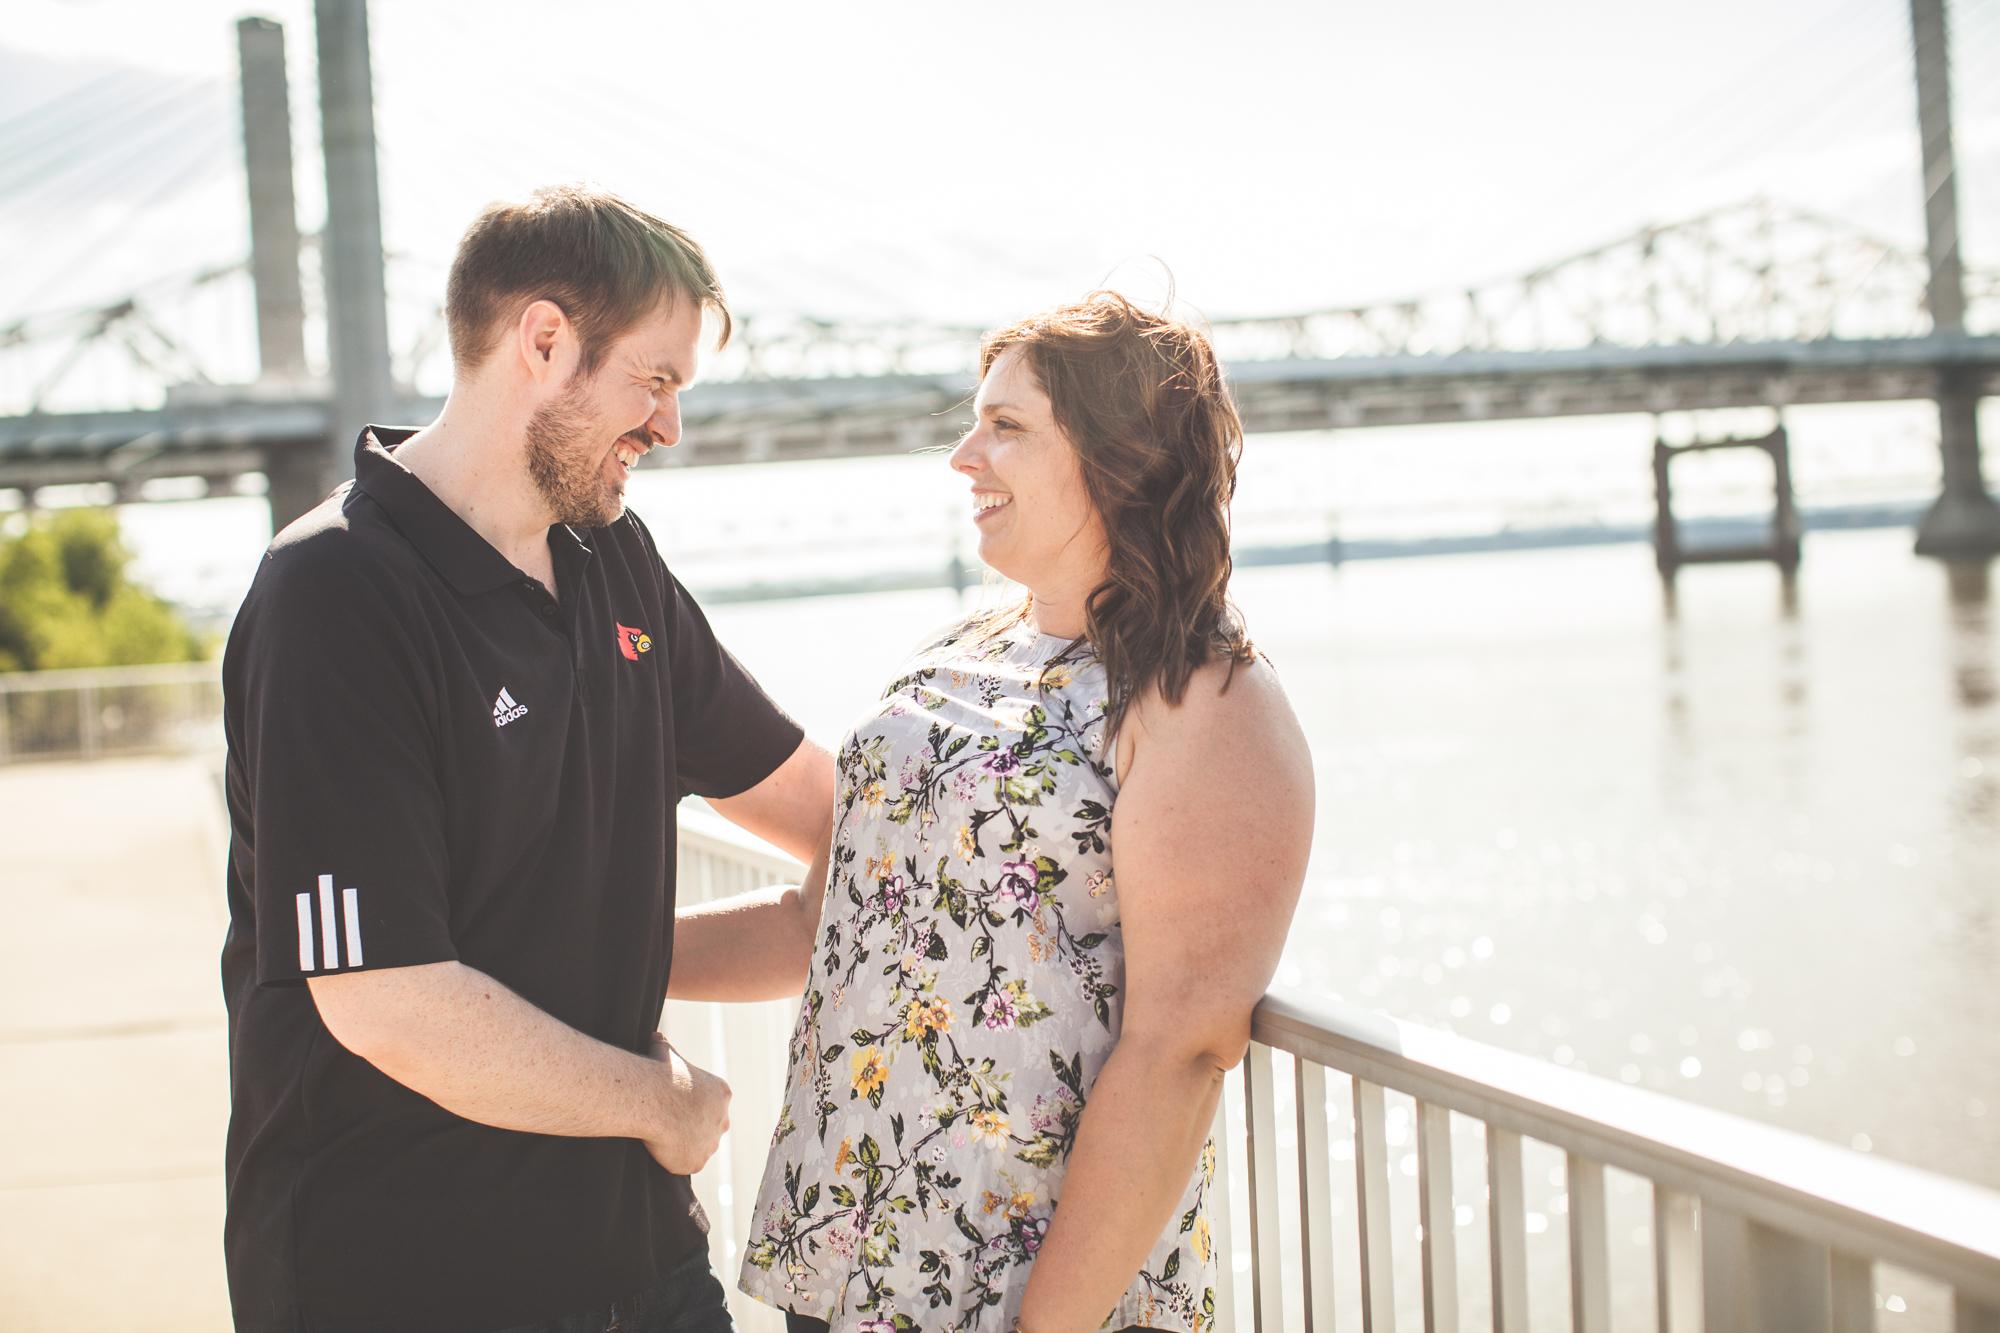 20180507-BridgetAdam-Engagement-blog-25.jpg